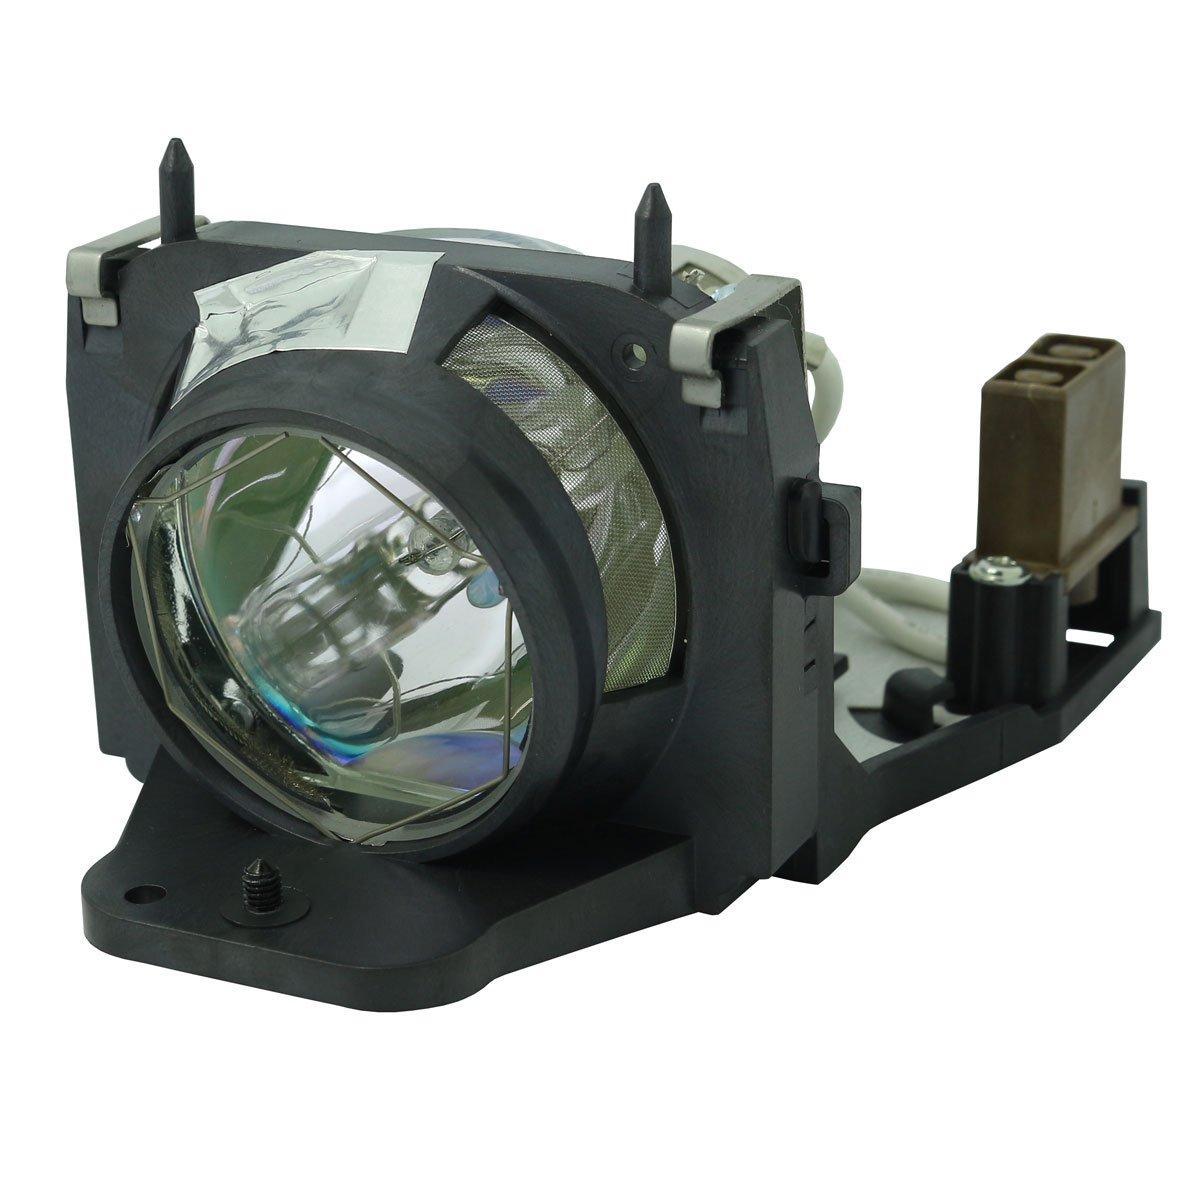 LYTIO エコノミー InFocus SP-LAMP-002A プロジェクターランプ ハウジング付き SP-LAMP002A   B07JGN8WRX